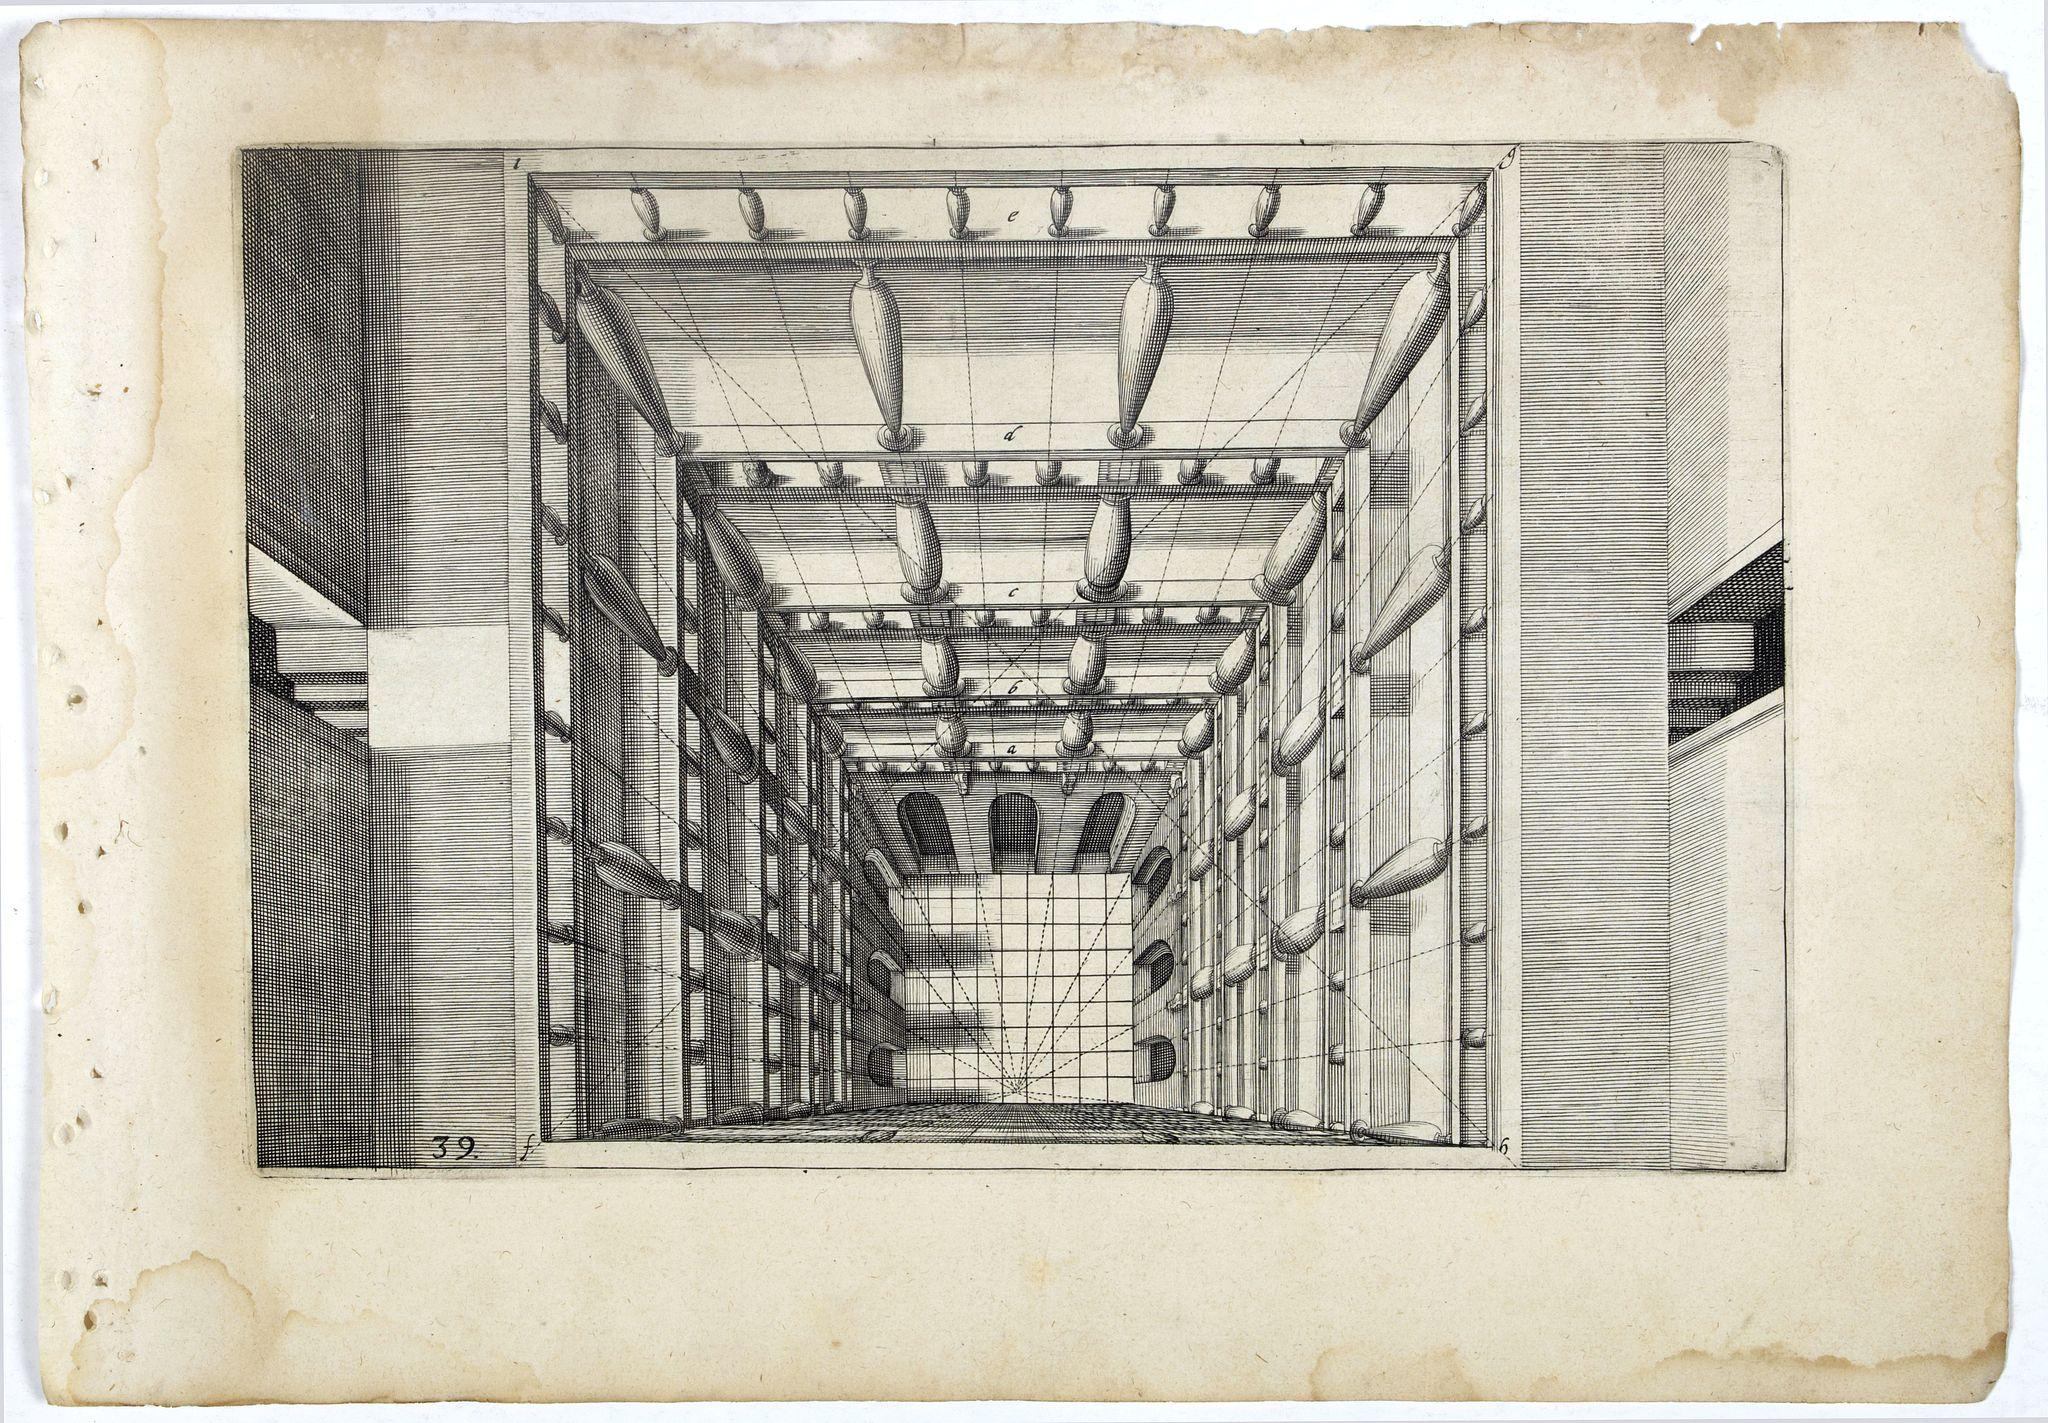 VREDEMAN DE VRIES, J. / HONDIUS, H. -  Perspective print by Vredeman de Vries. 39.